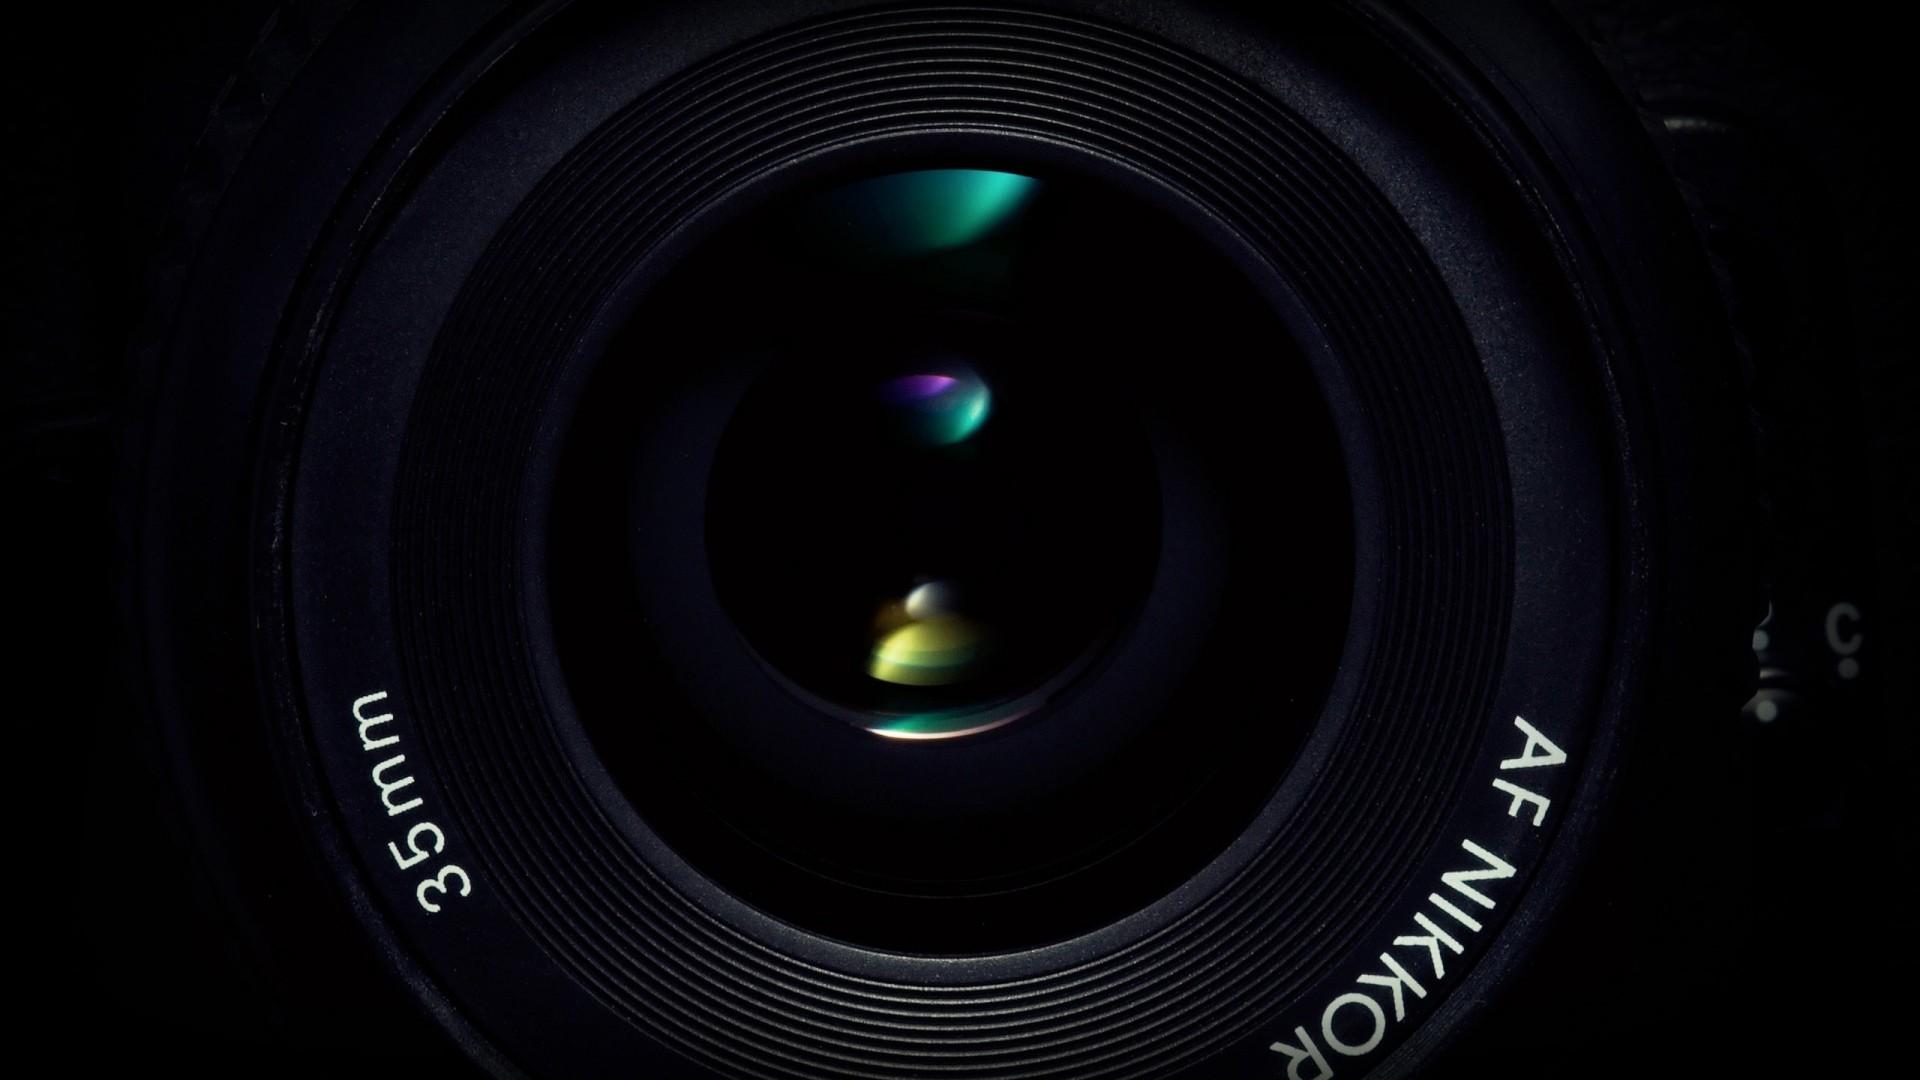 video camera wallpaper (64+ images)